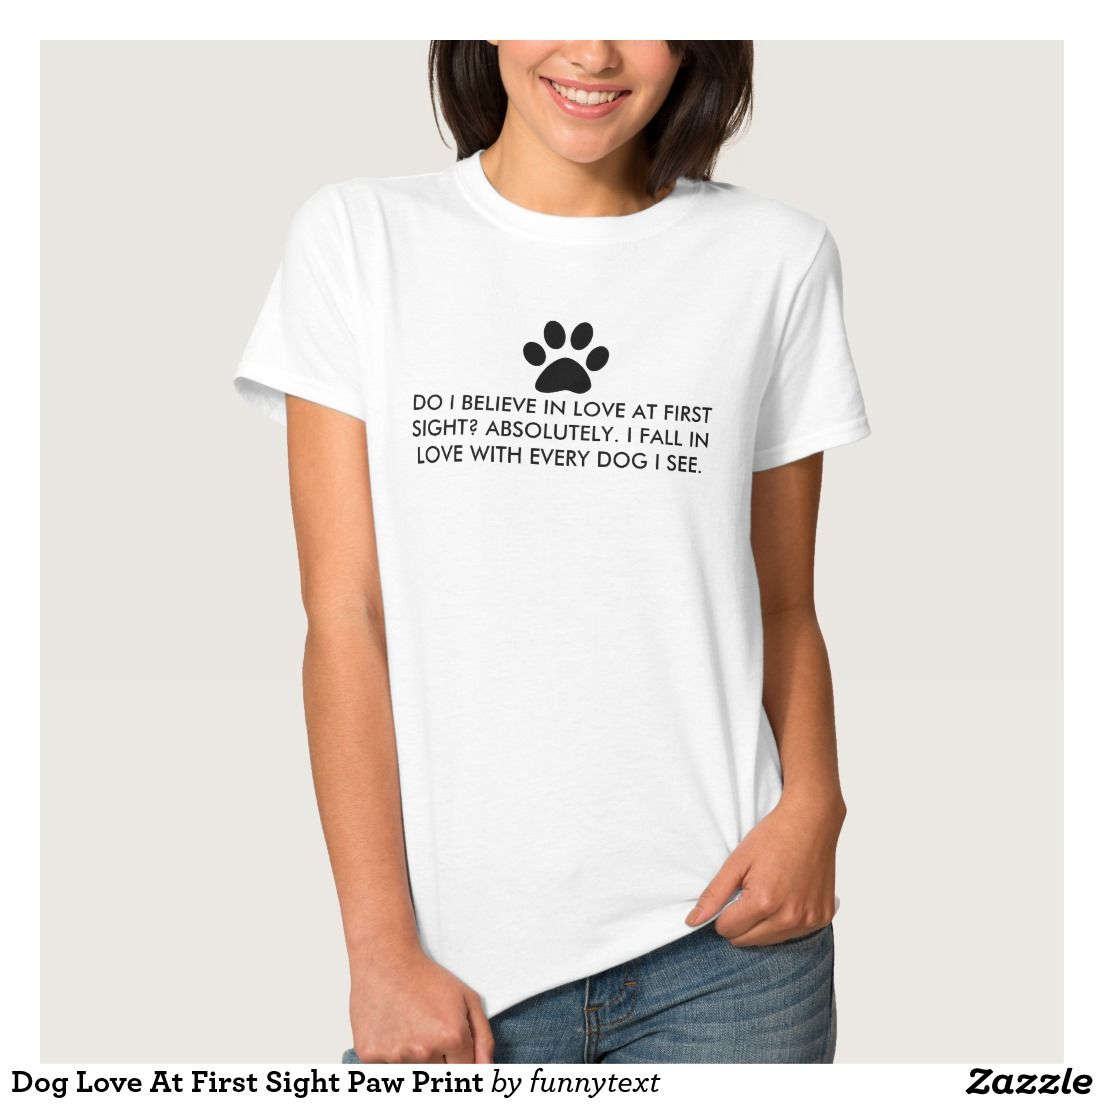 Zazzle t shirt design template - Dog Love At First Sight Paw Print T Shirt